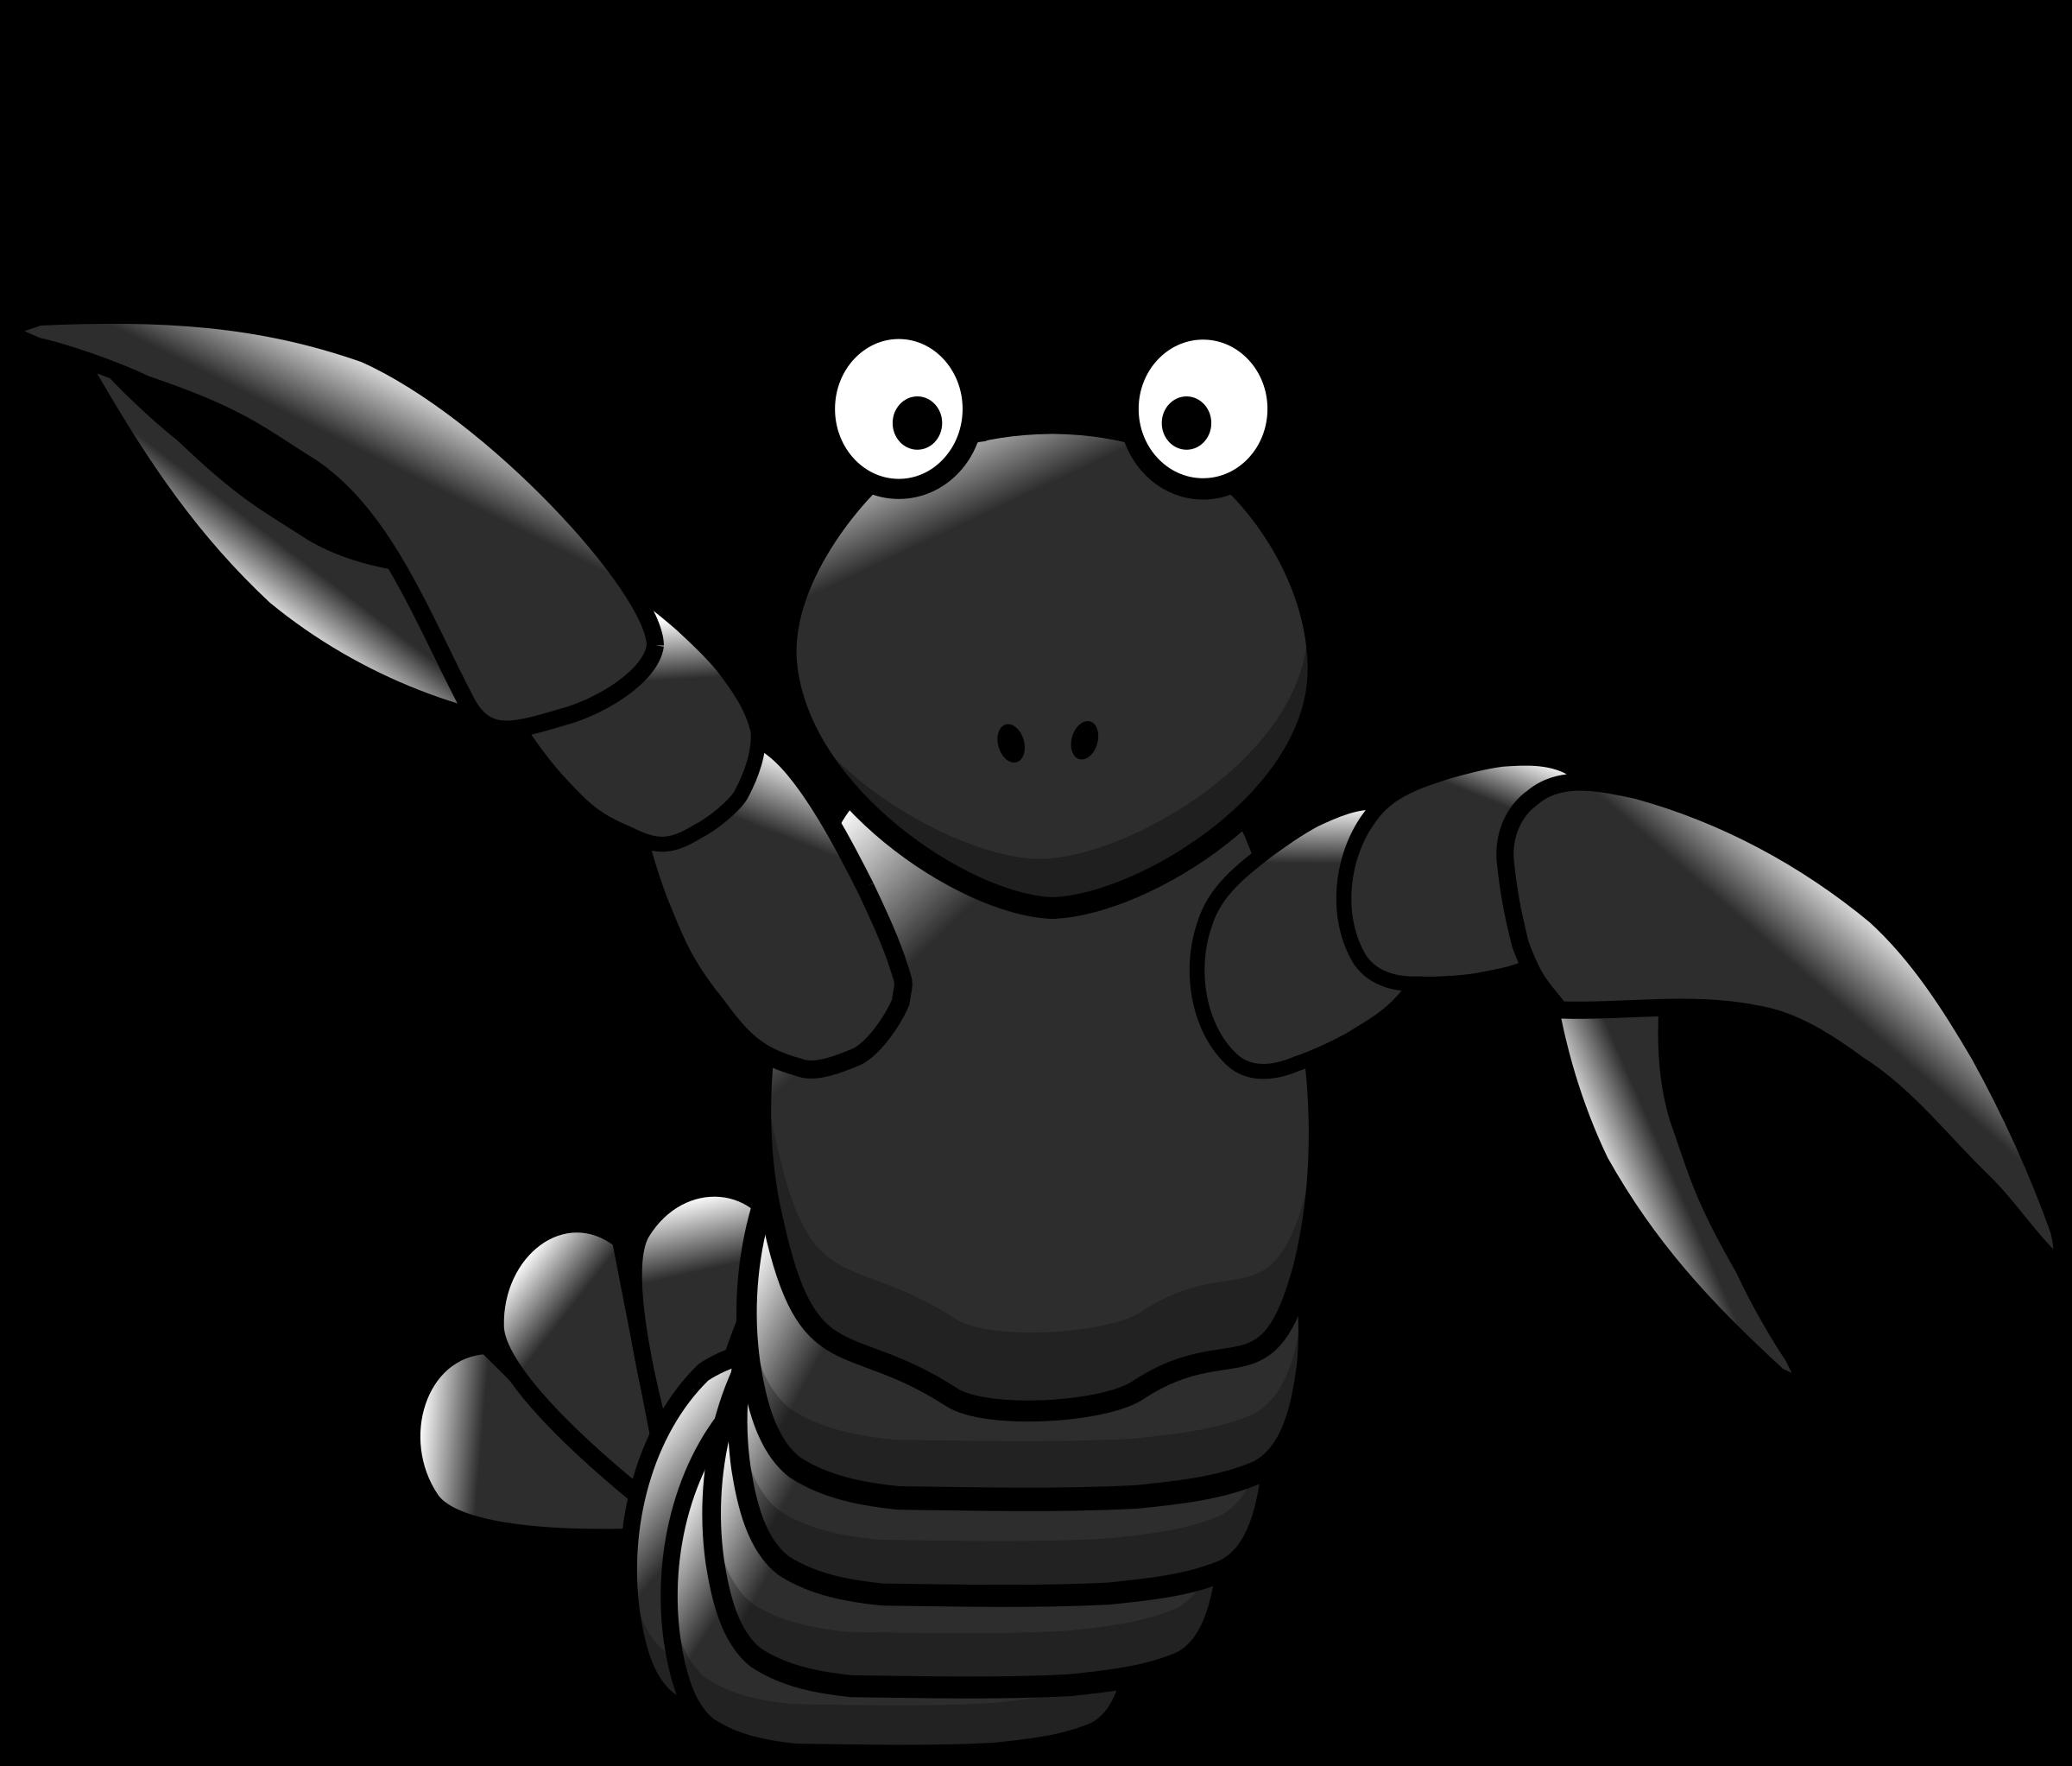 Crab clipart crab stick. Cartoon lobster animal free